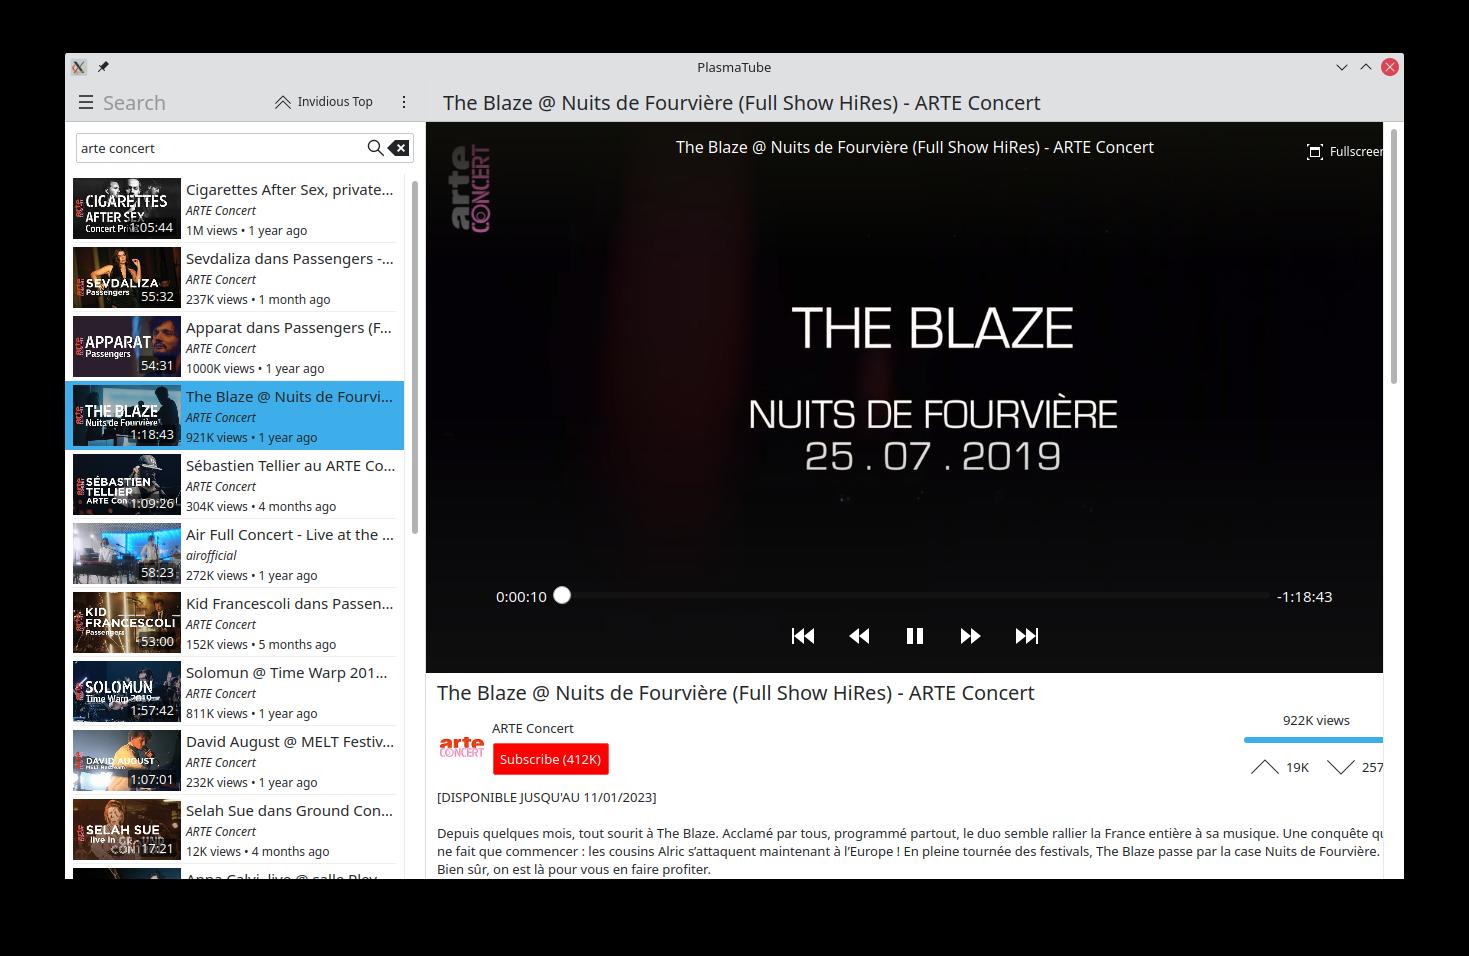 PlasmaTube on the desktop